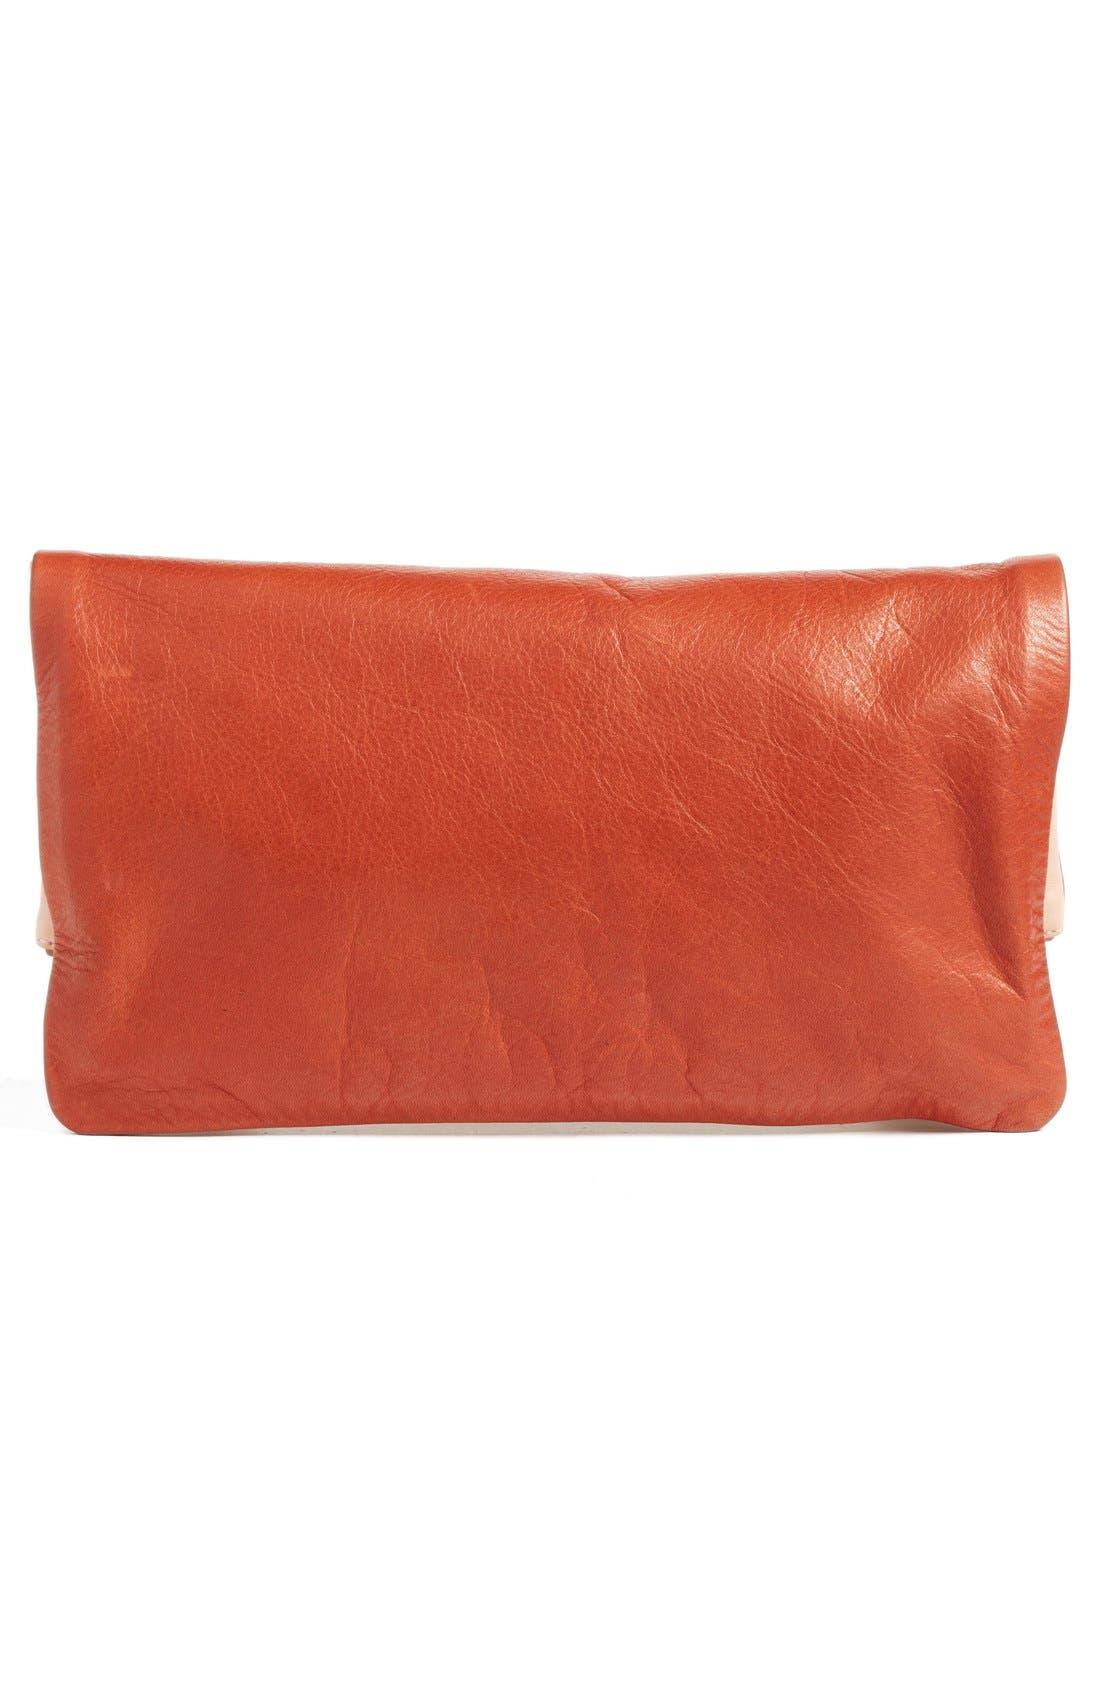 Alternate Image 3  - Clare V. Colorblock Leather Foldover Clutch